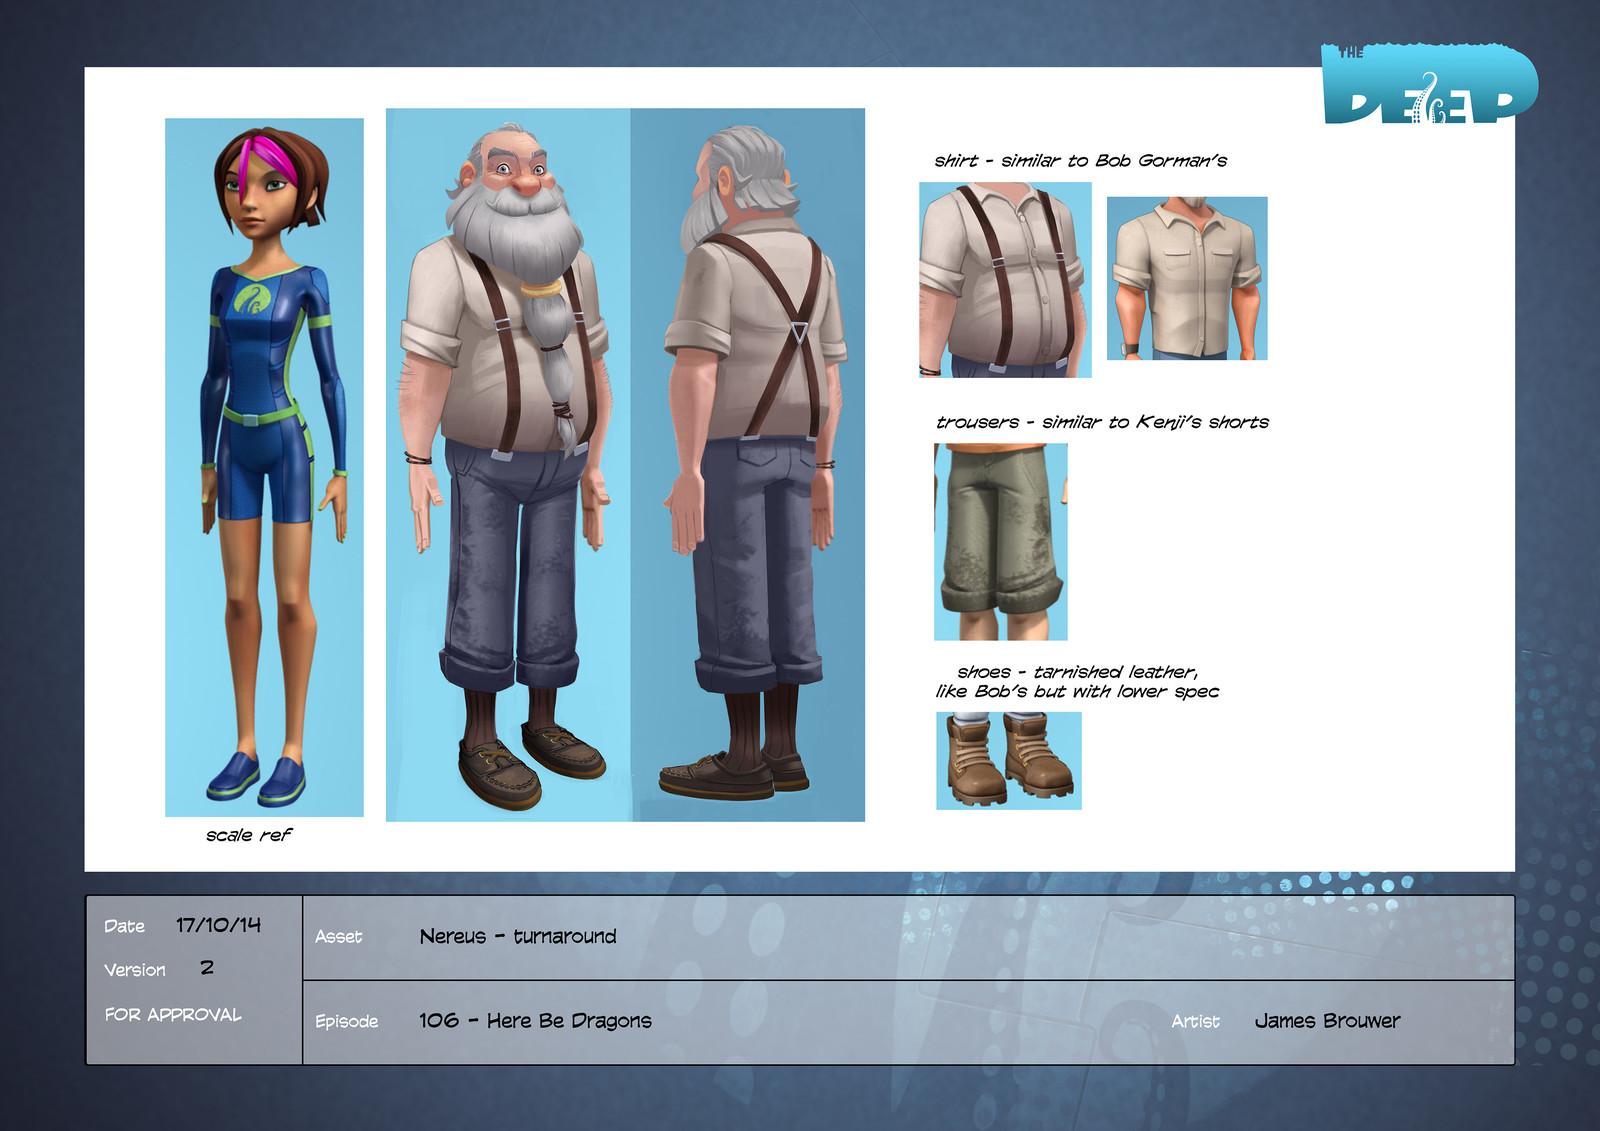 Final character design for Nereus.